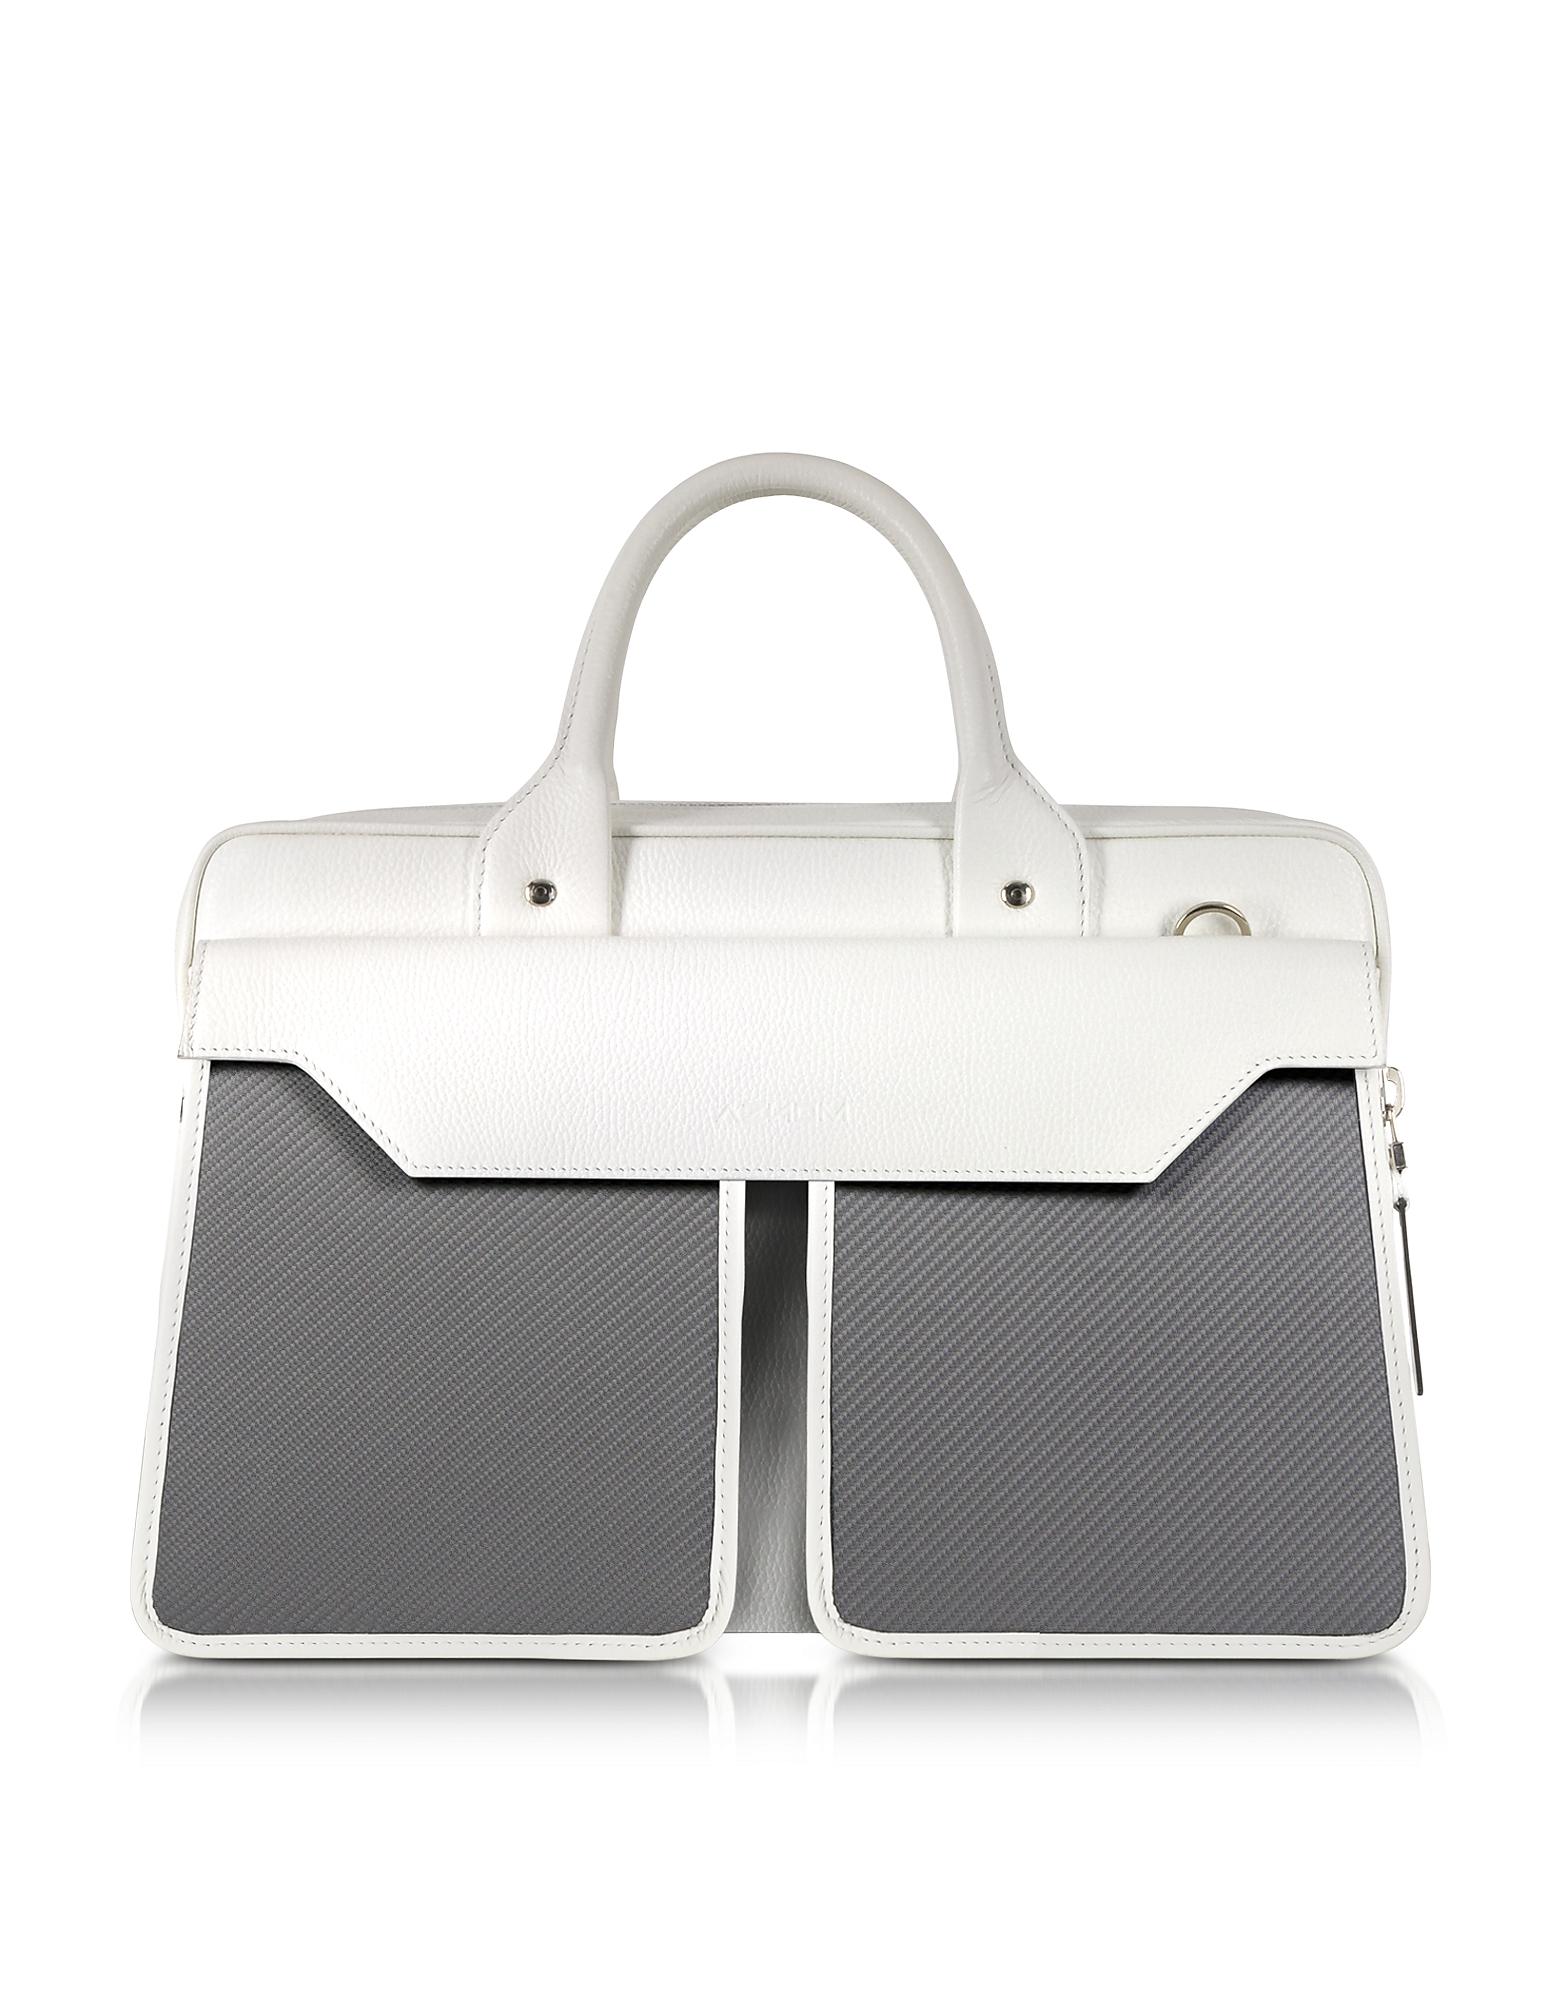 Aznom Briefcases, Tre Tasche Large Tote